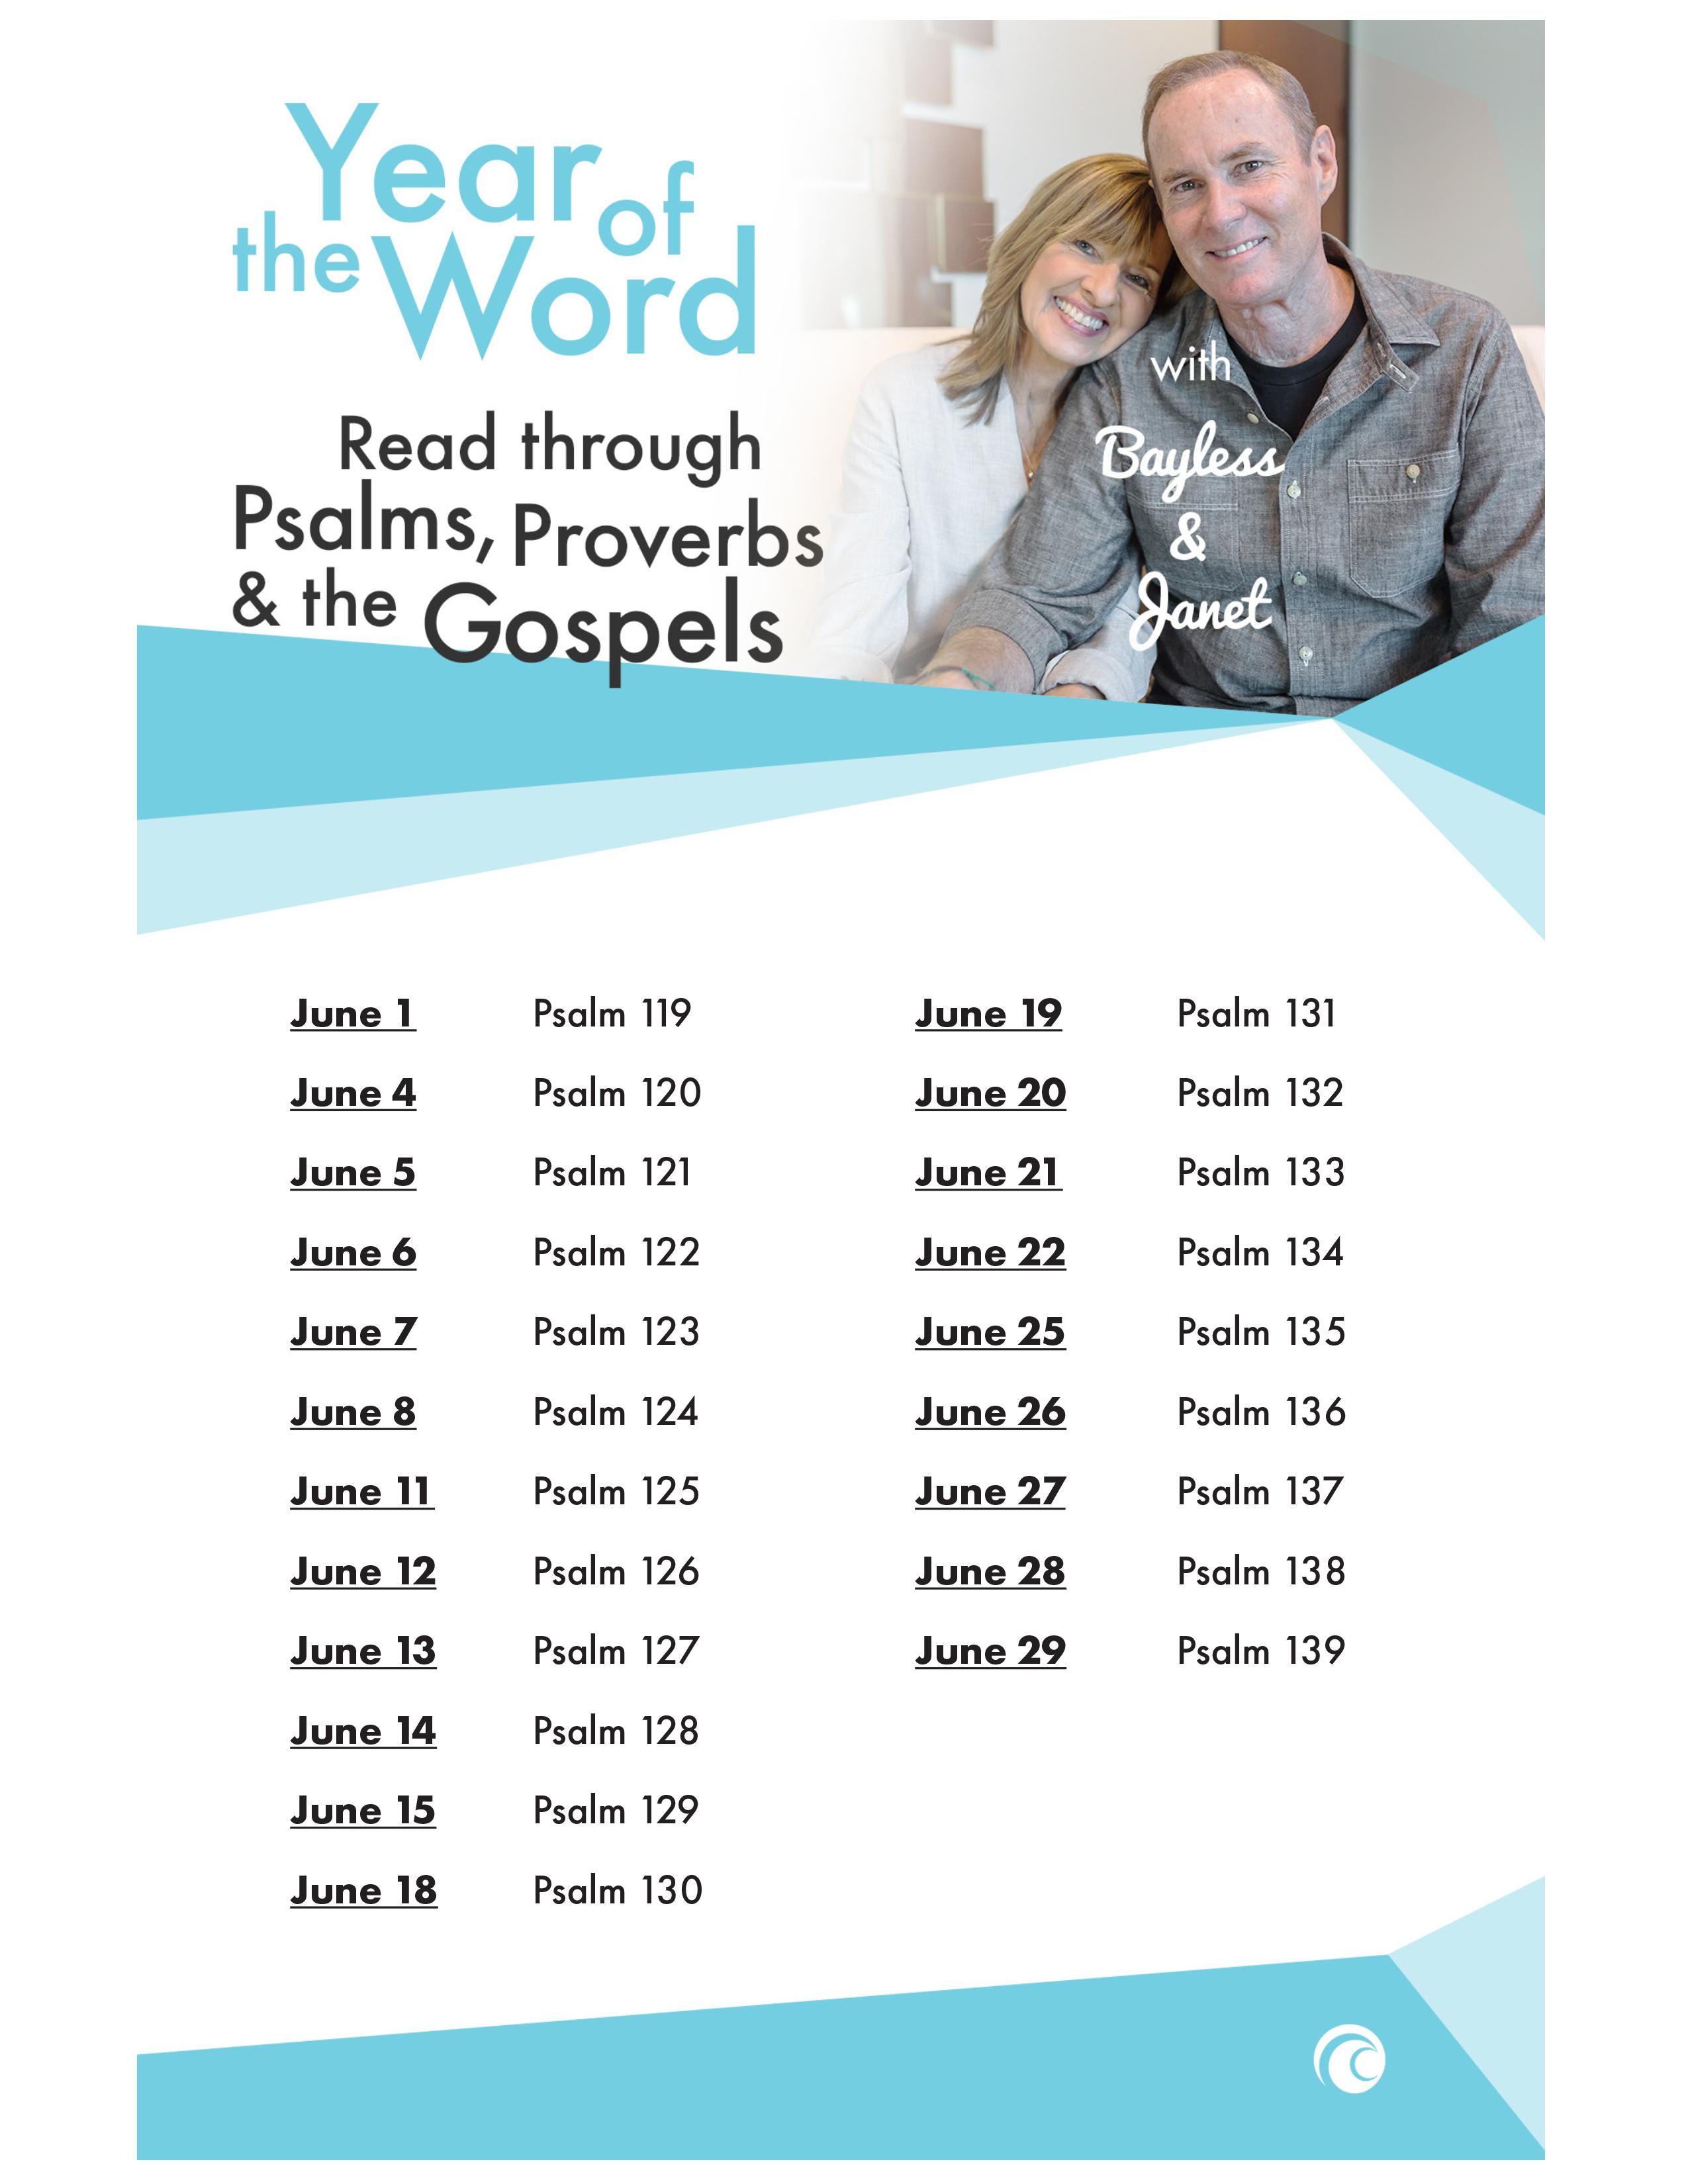 YOTW Psalms Proverbs Gospels June 2018